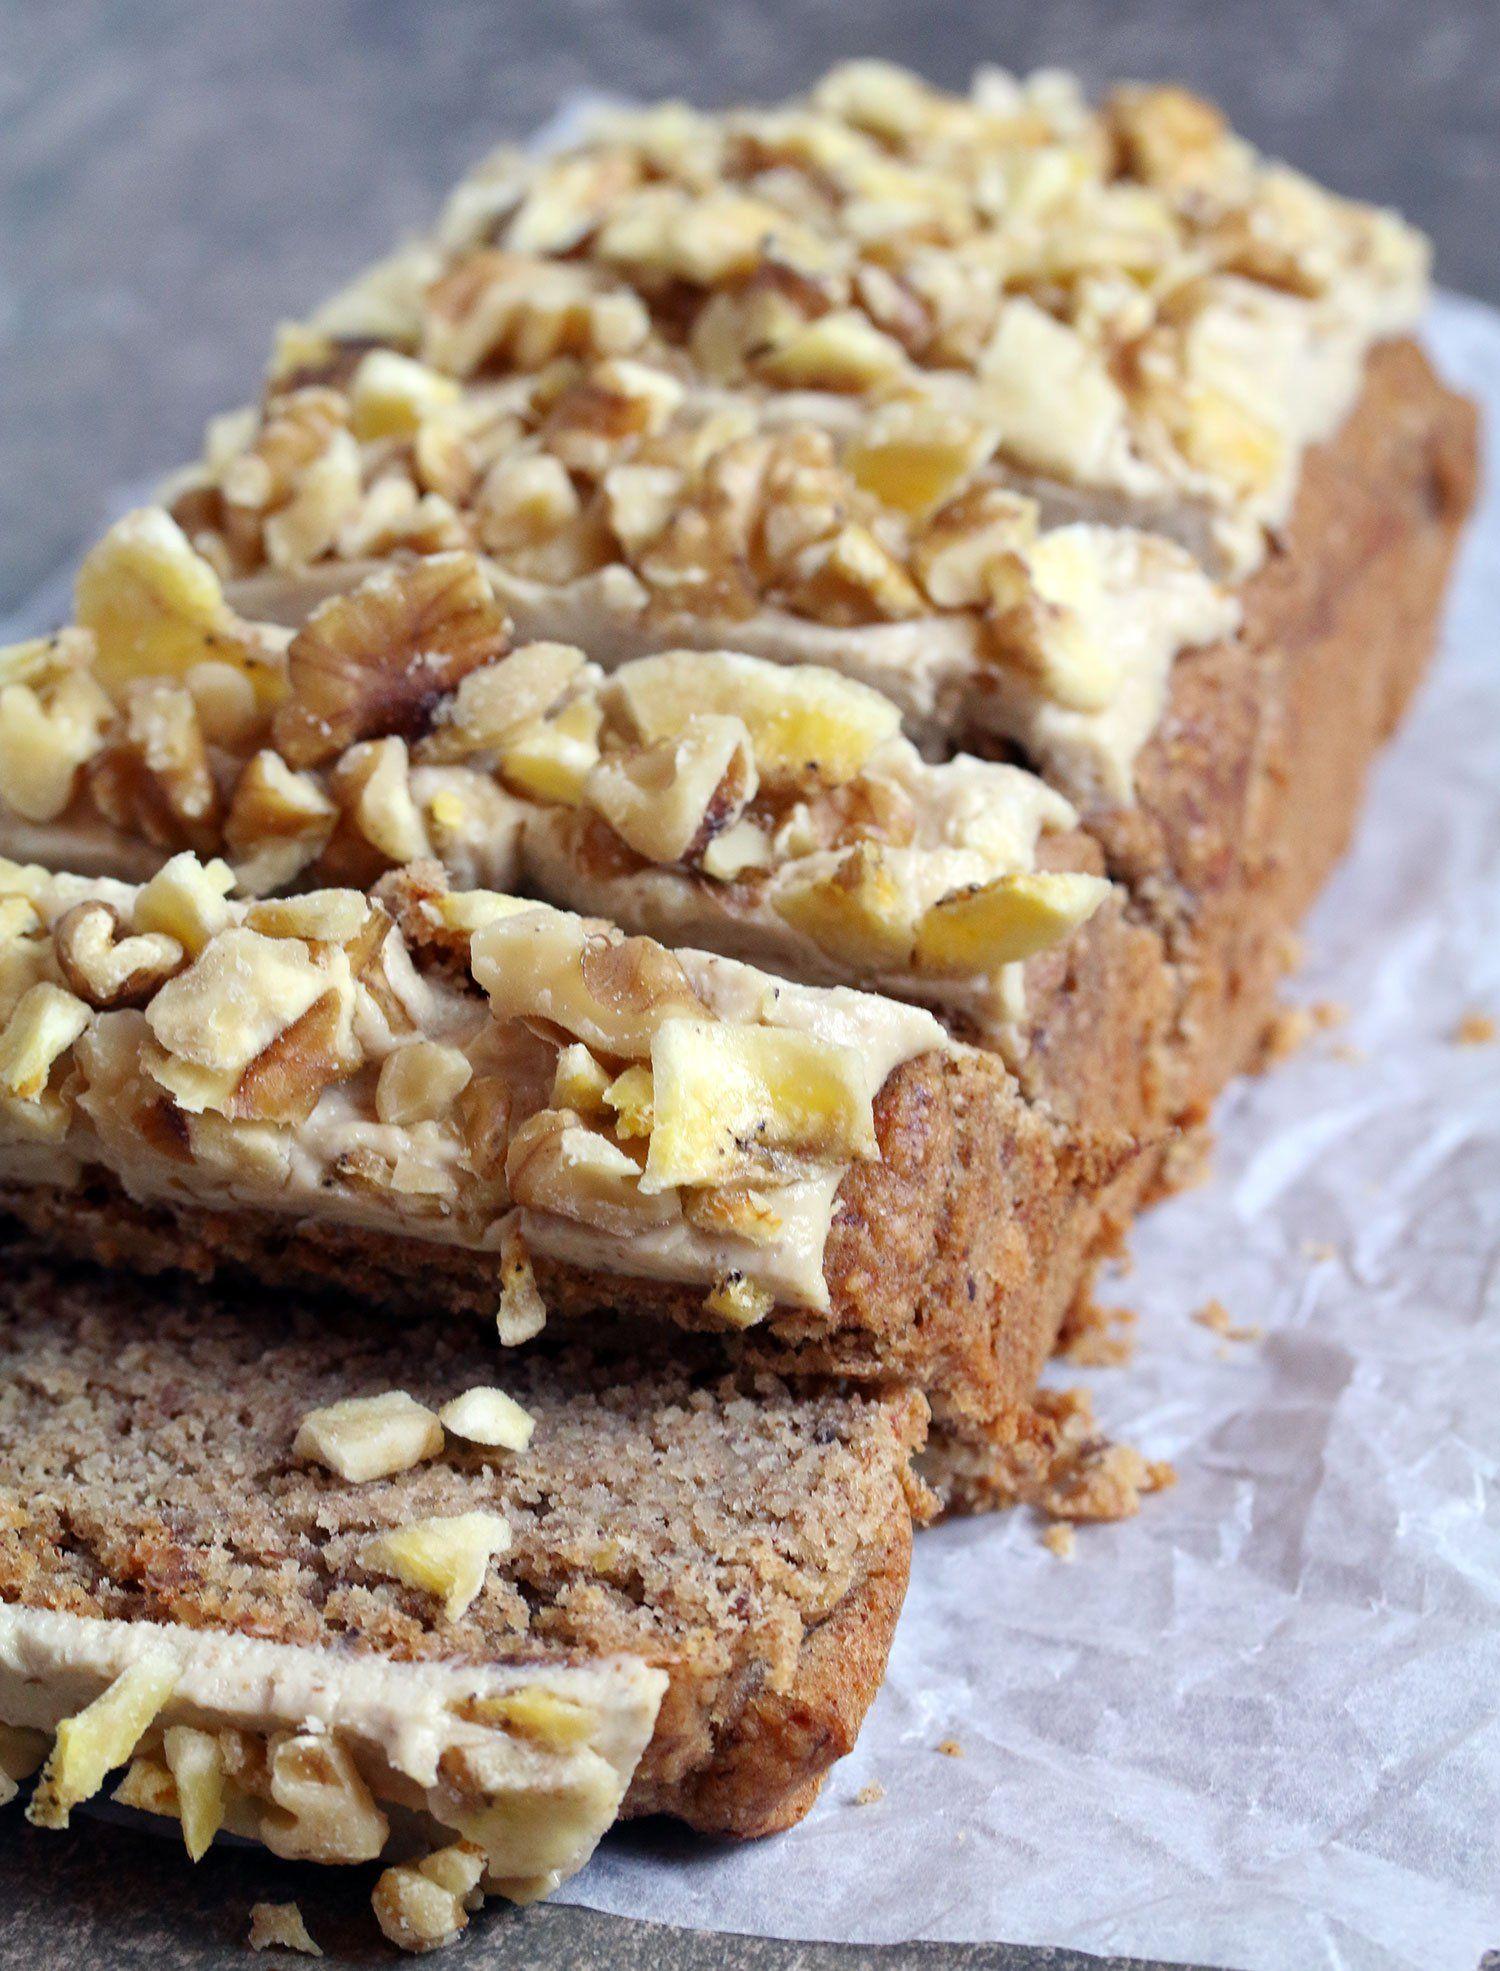 Banana bread with creamy walnut frosting vegan gluten